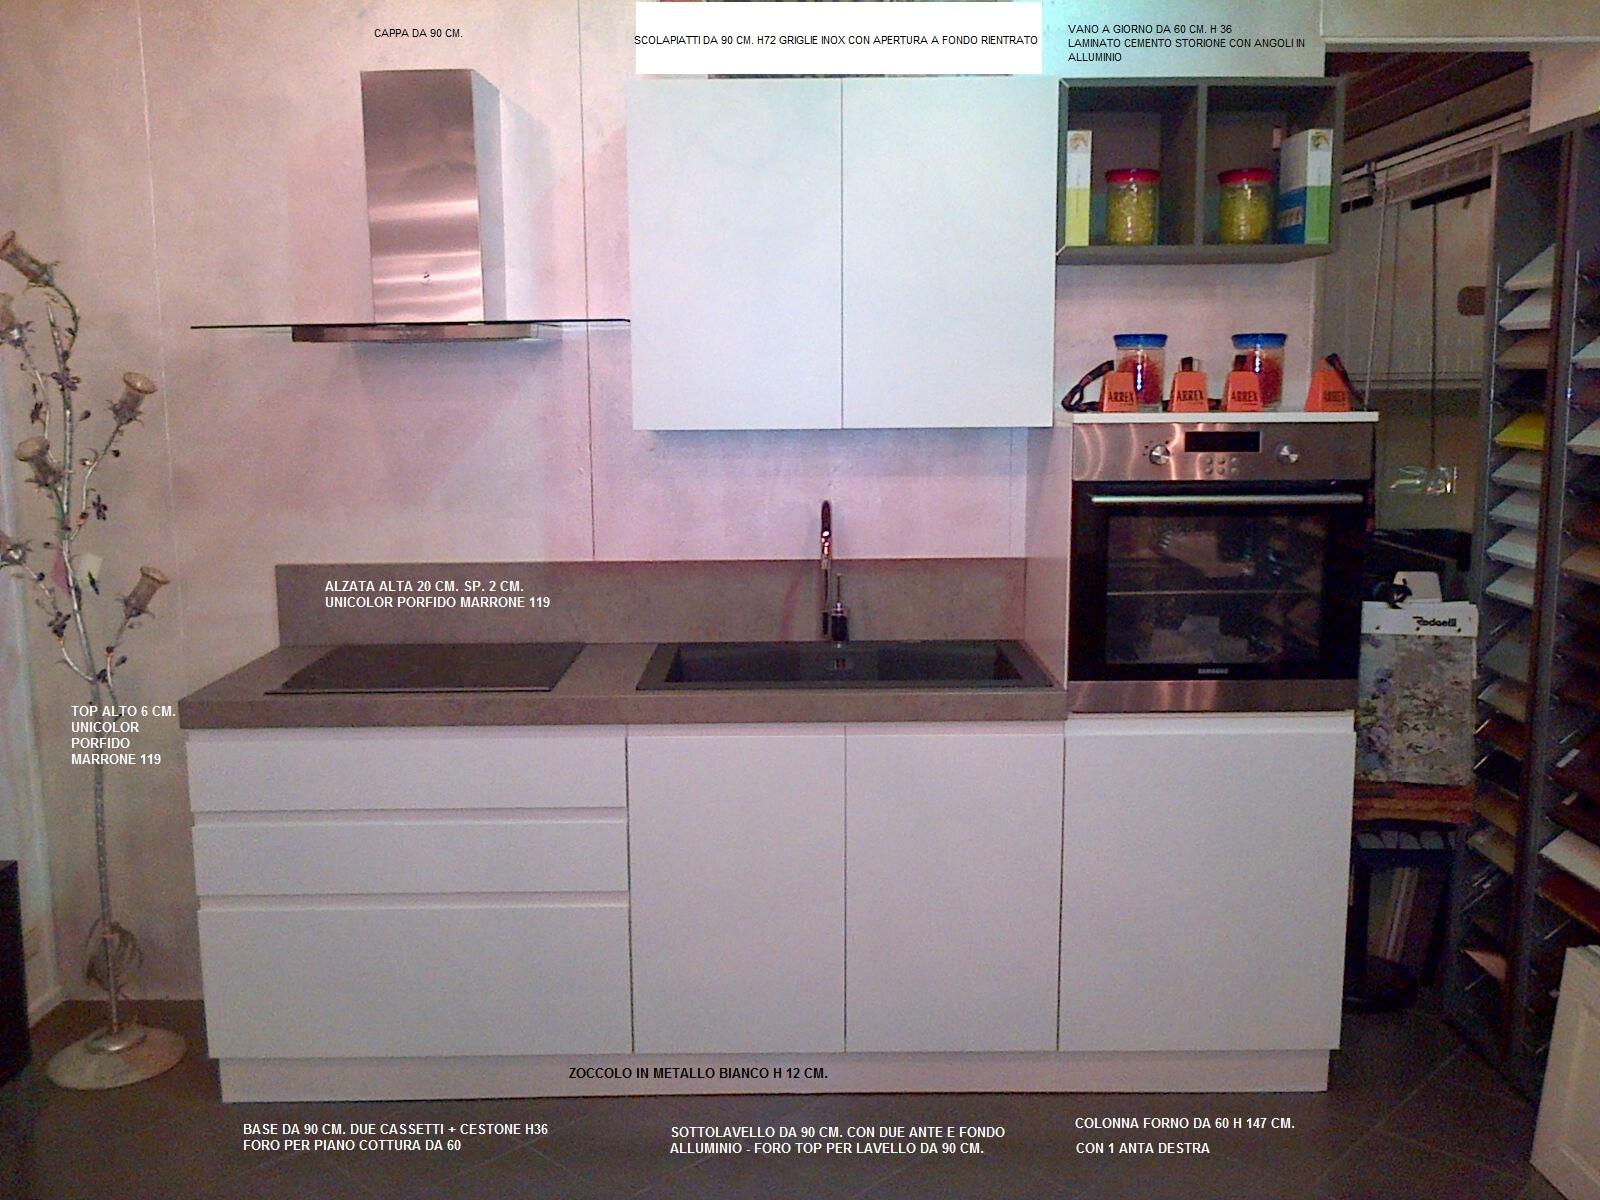 Cucina laccata bianca opaca modello arcobaleno di ar due - Cucina bianca e marrone ...